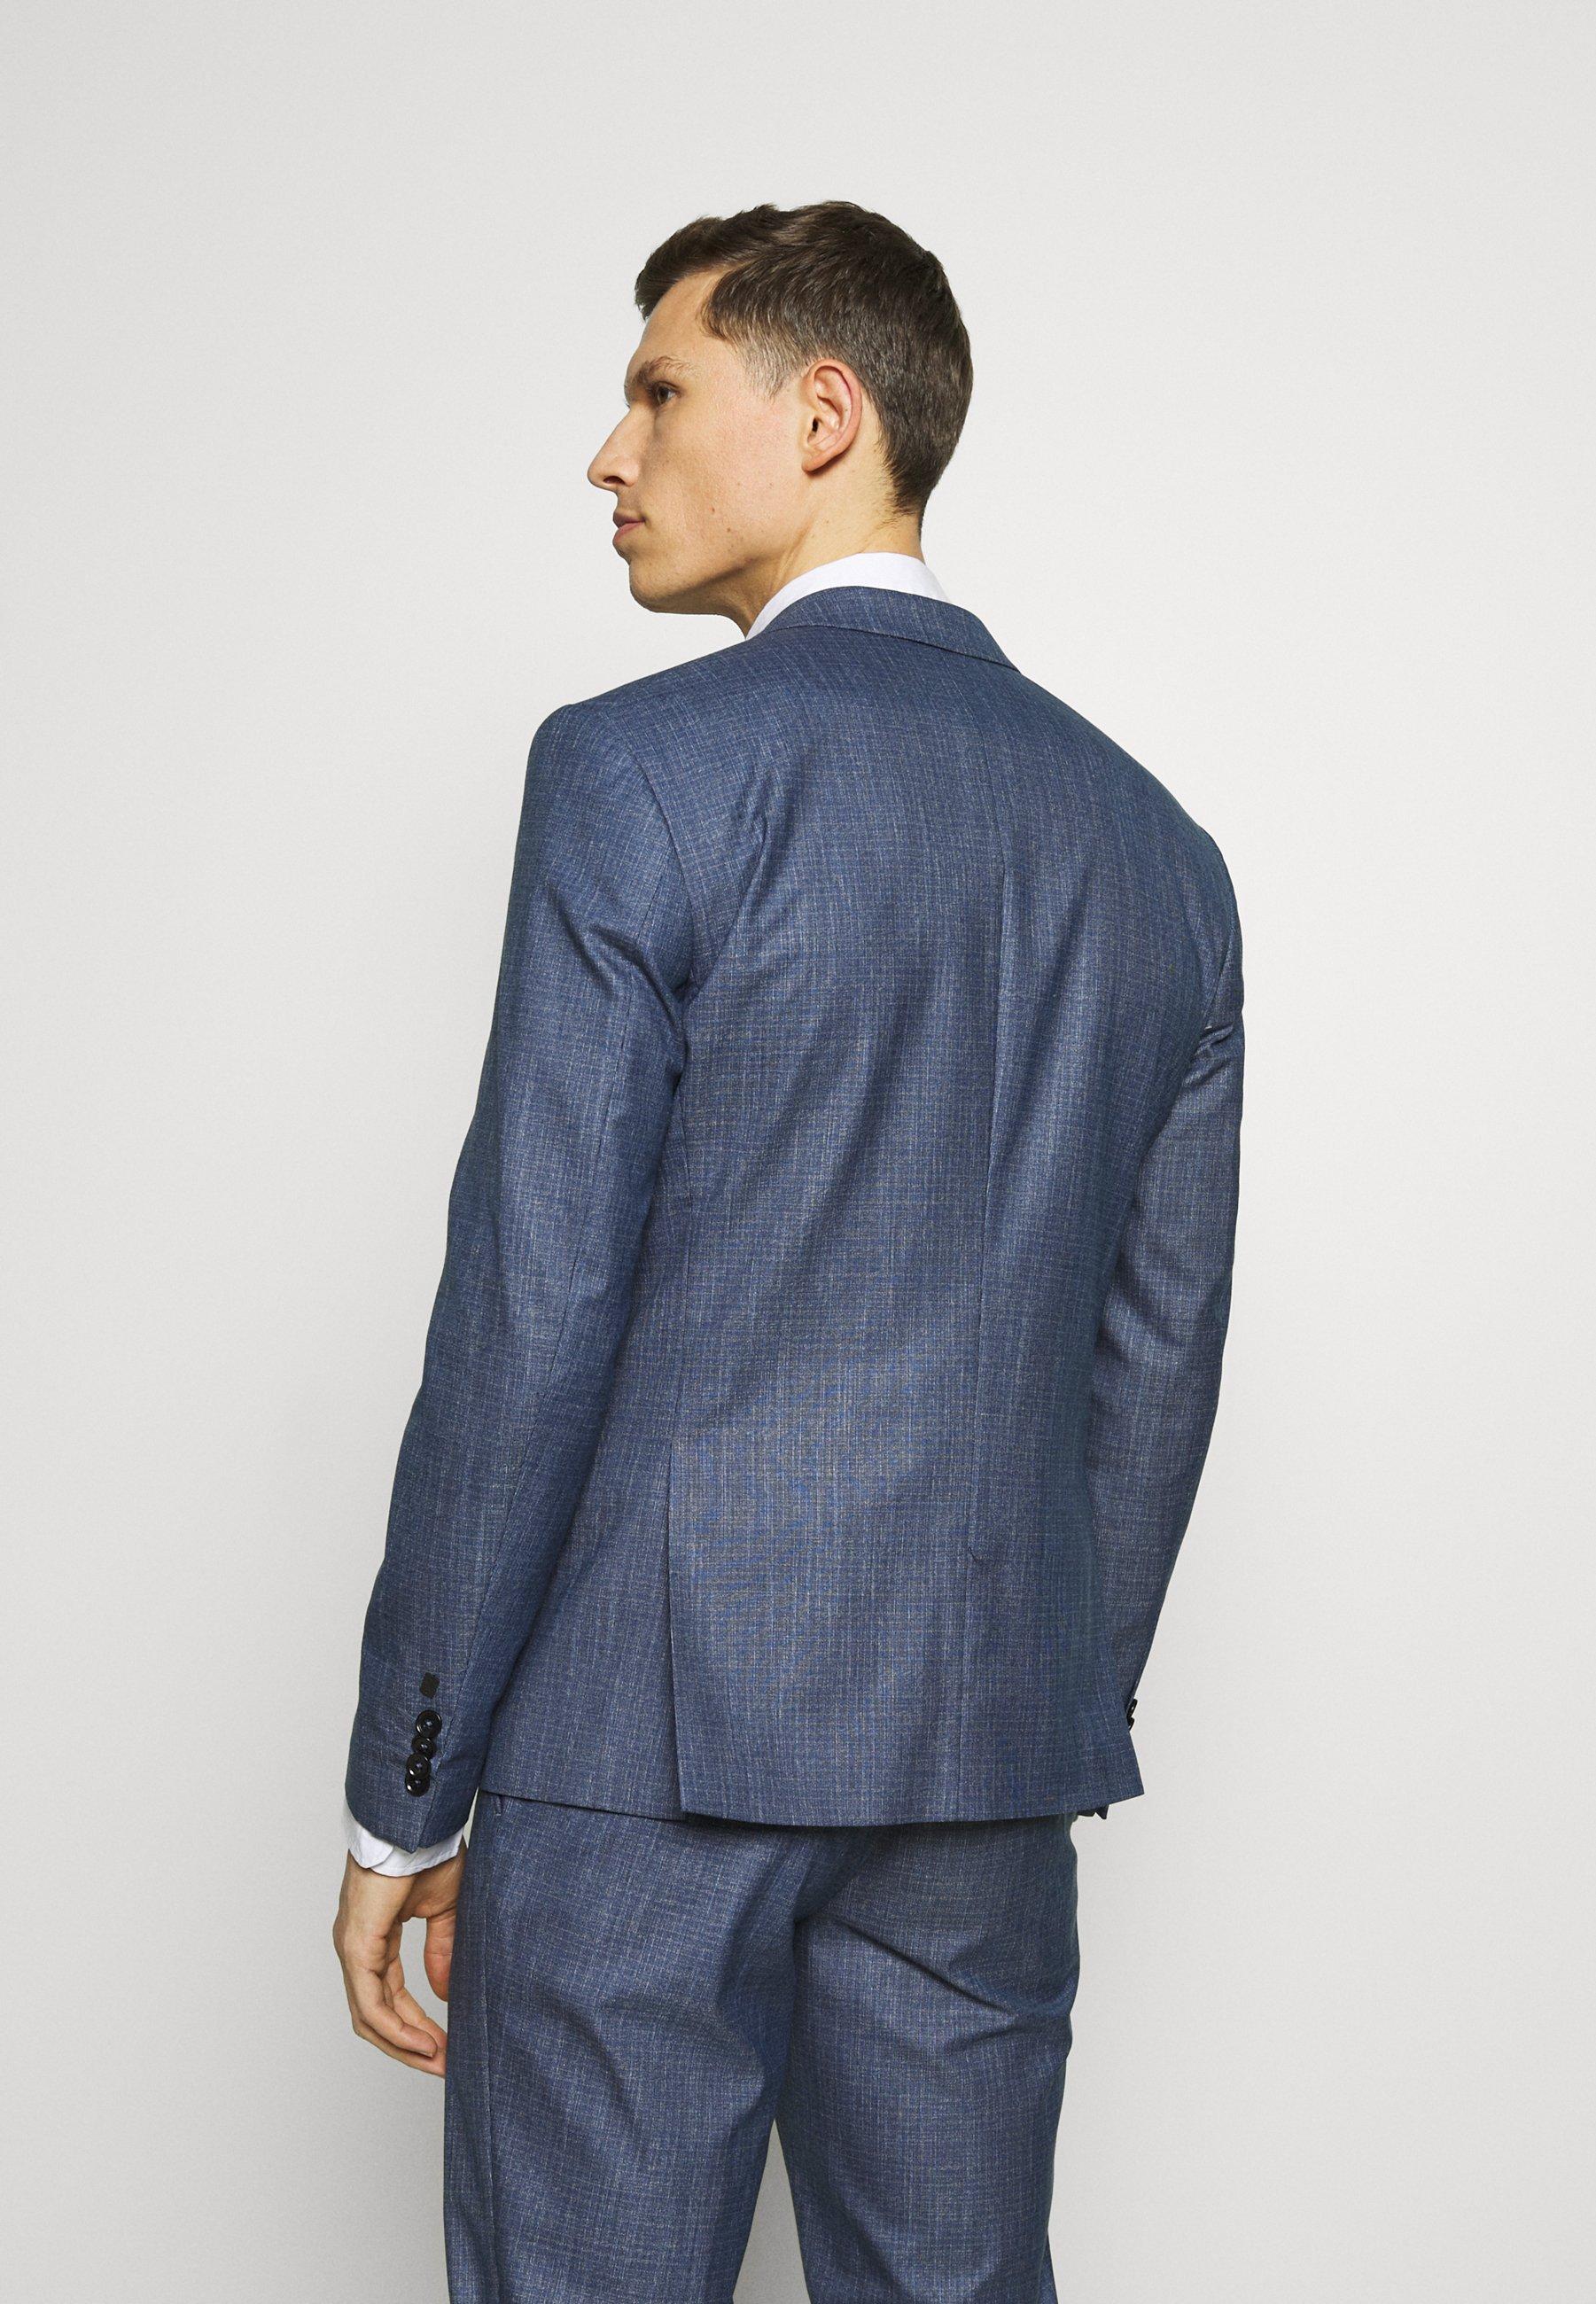 Bertoni Anderson Jepsen Suit - Costume Blue